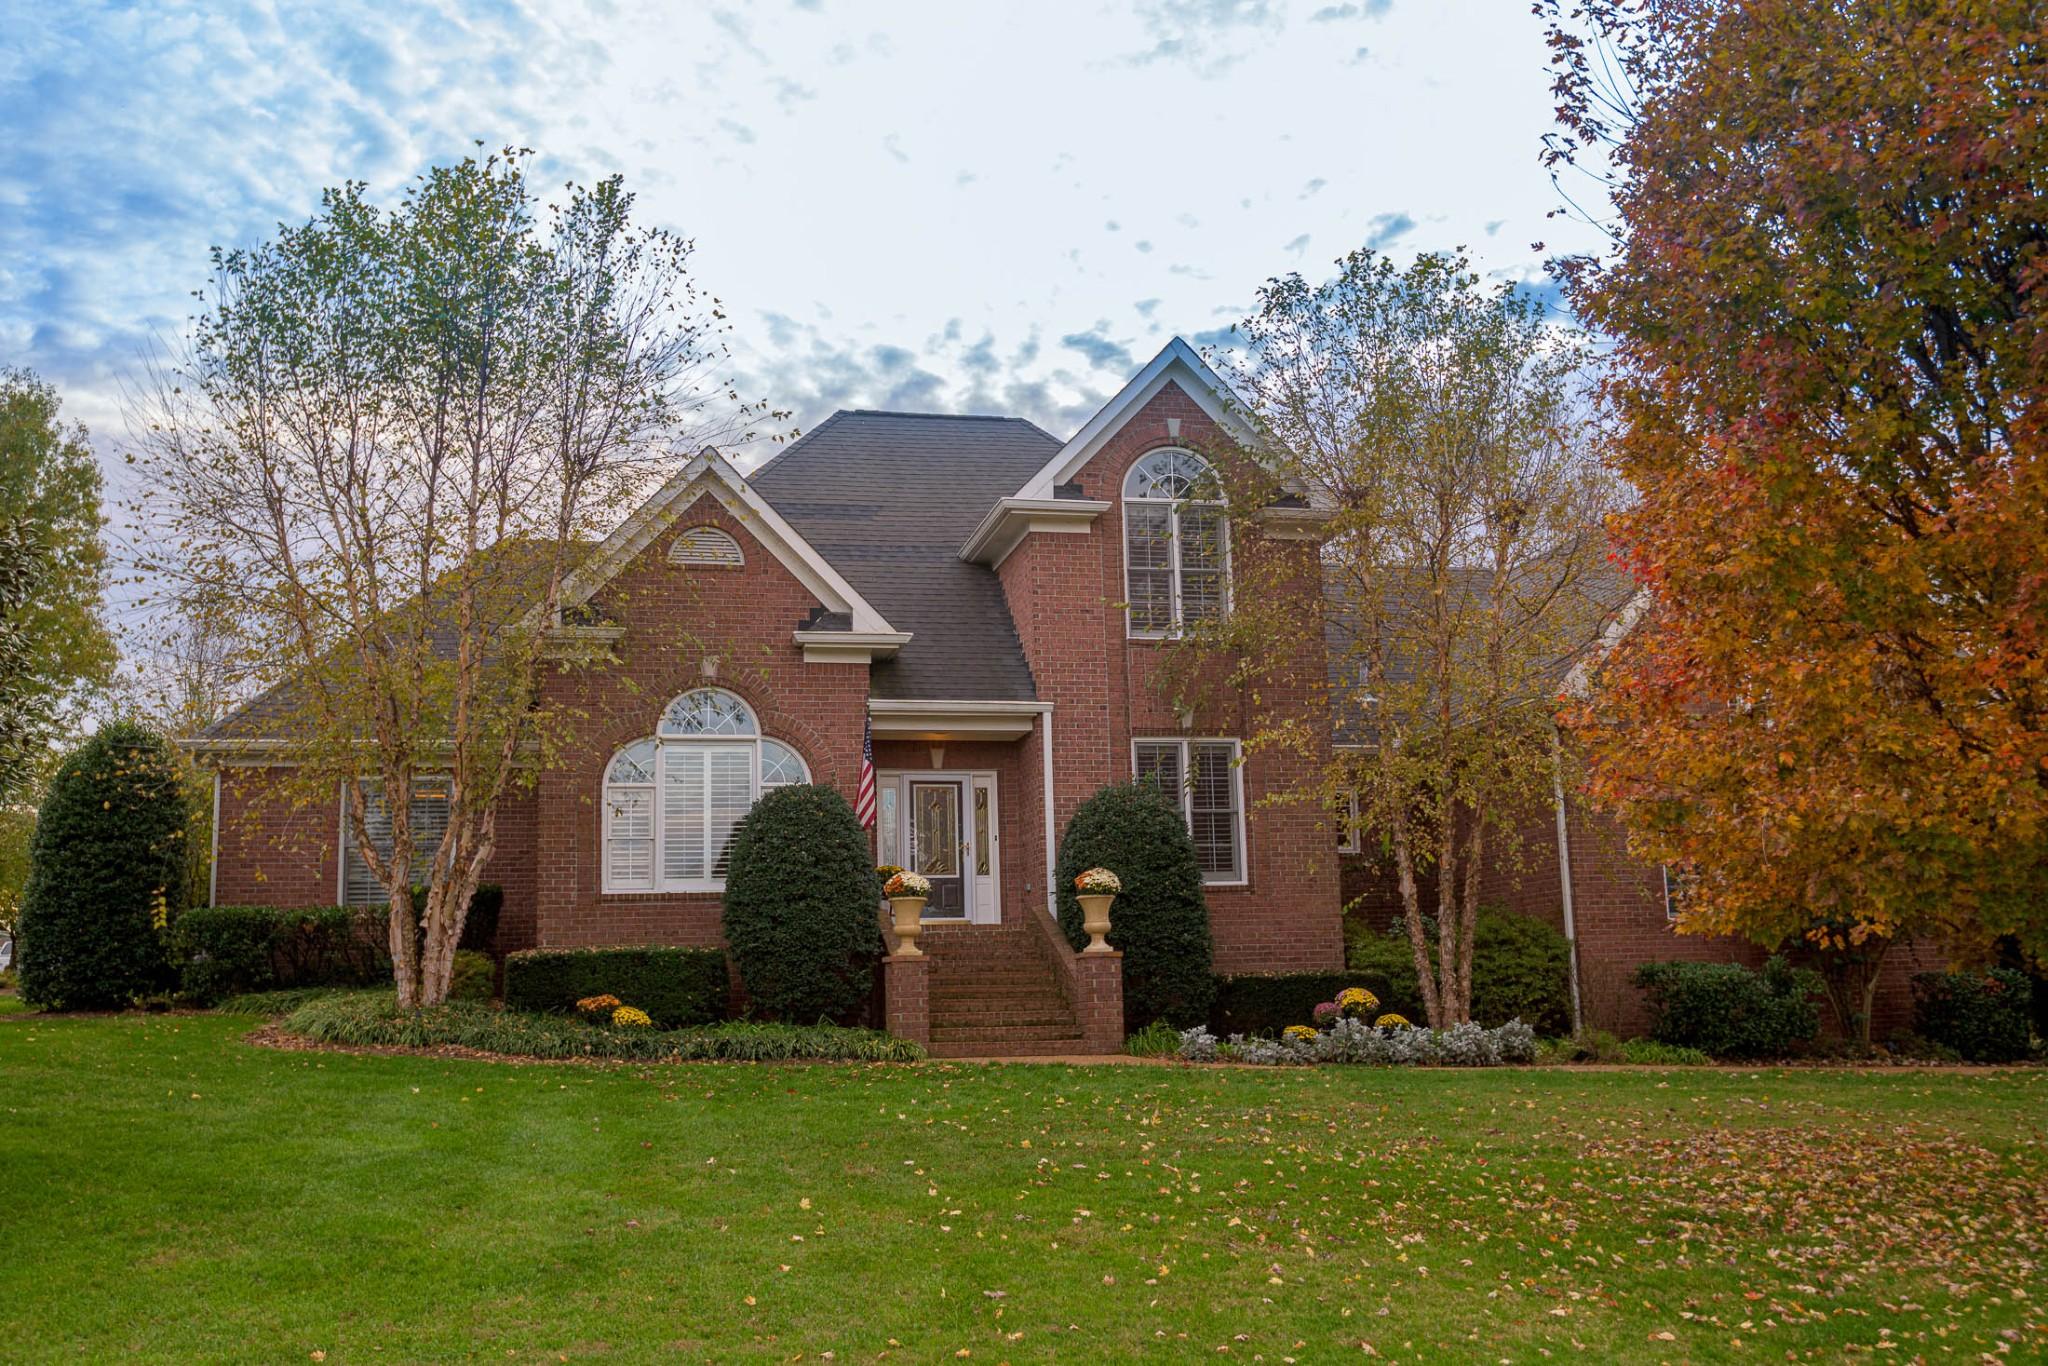 2109 Rodman Boulevard, Gallatin, TN 37066 - Gallatin, TN real estate listing